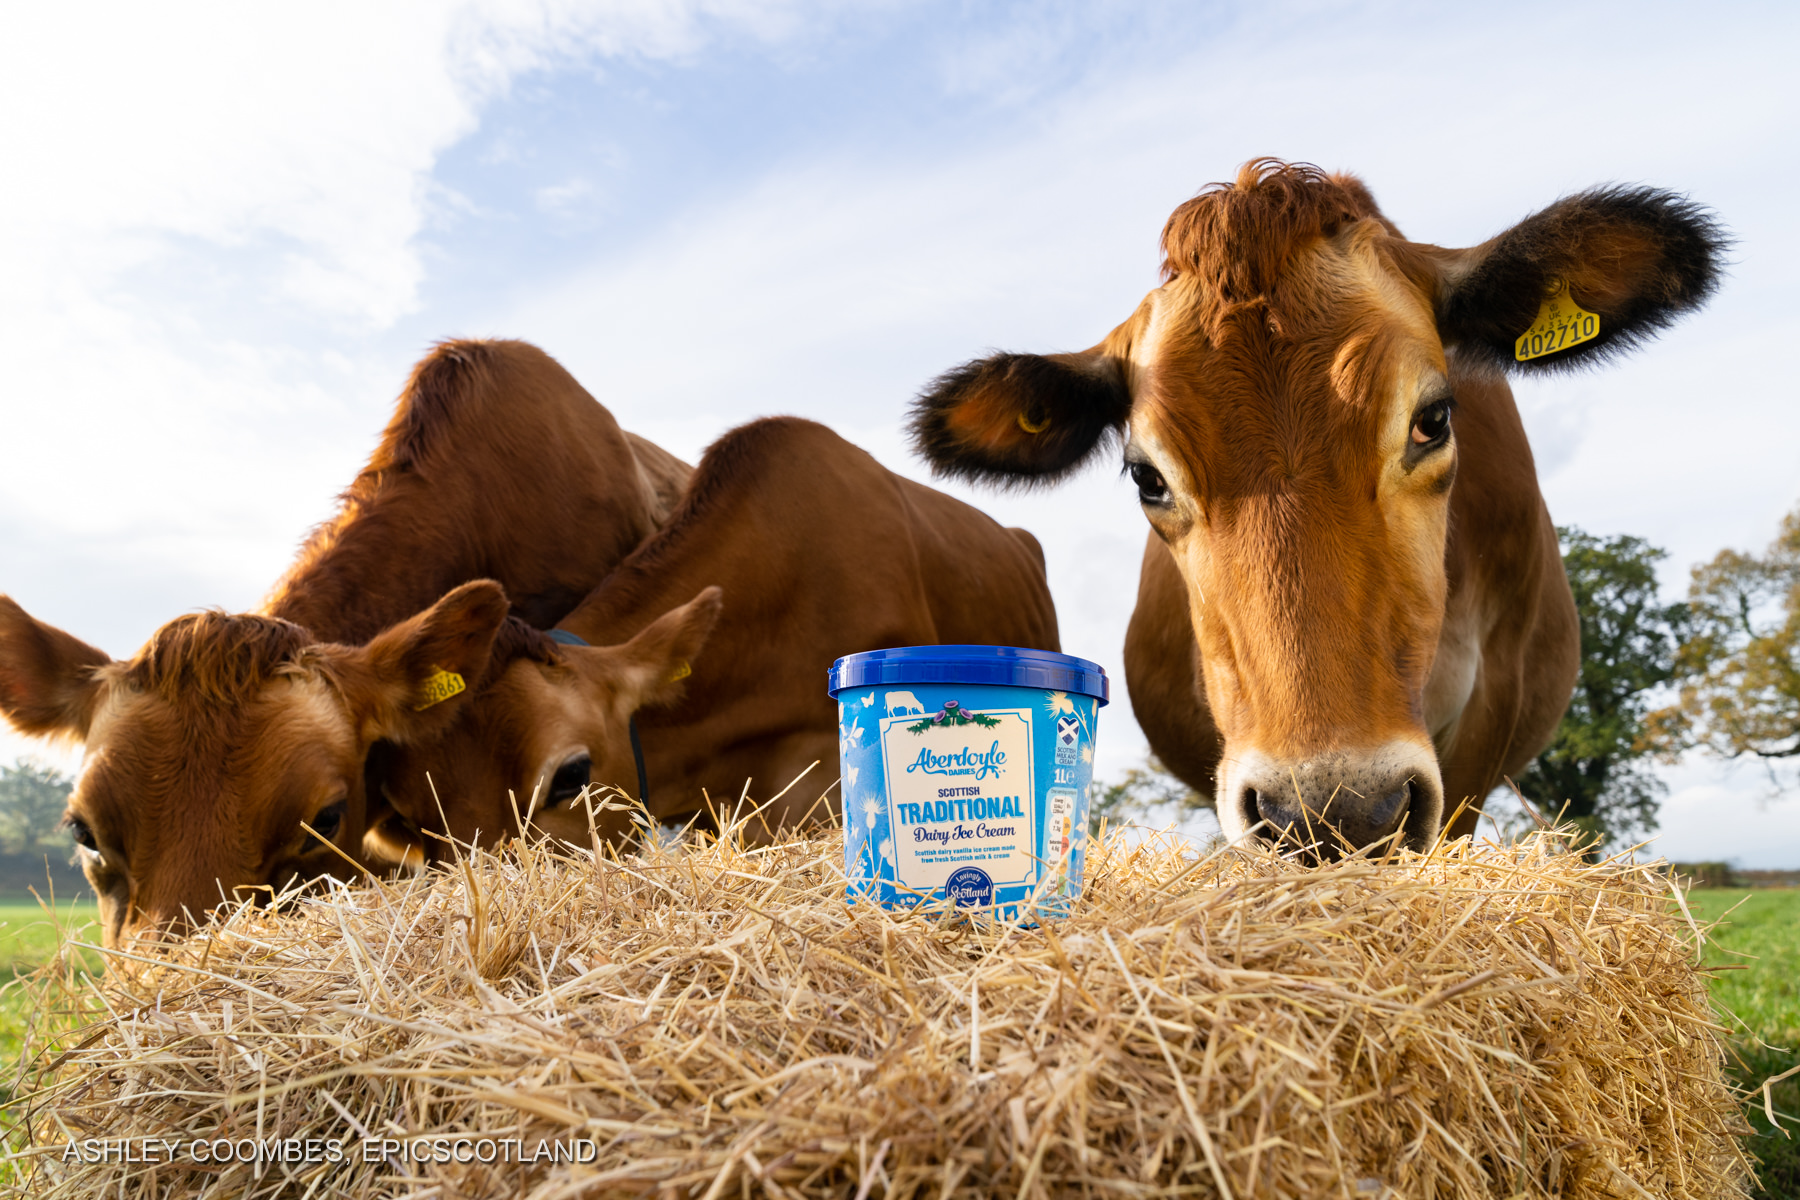 Graham's Family Dairy Epic Scotland Photography